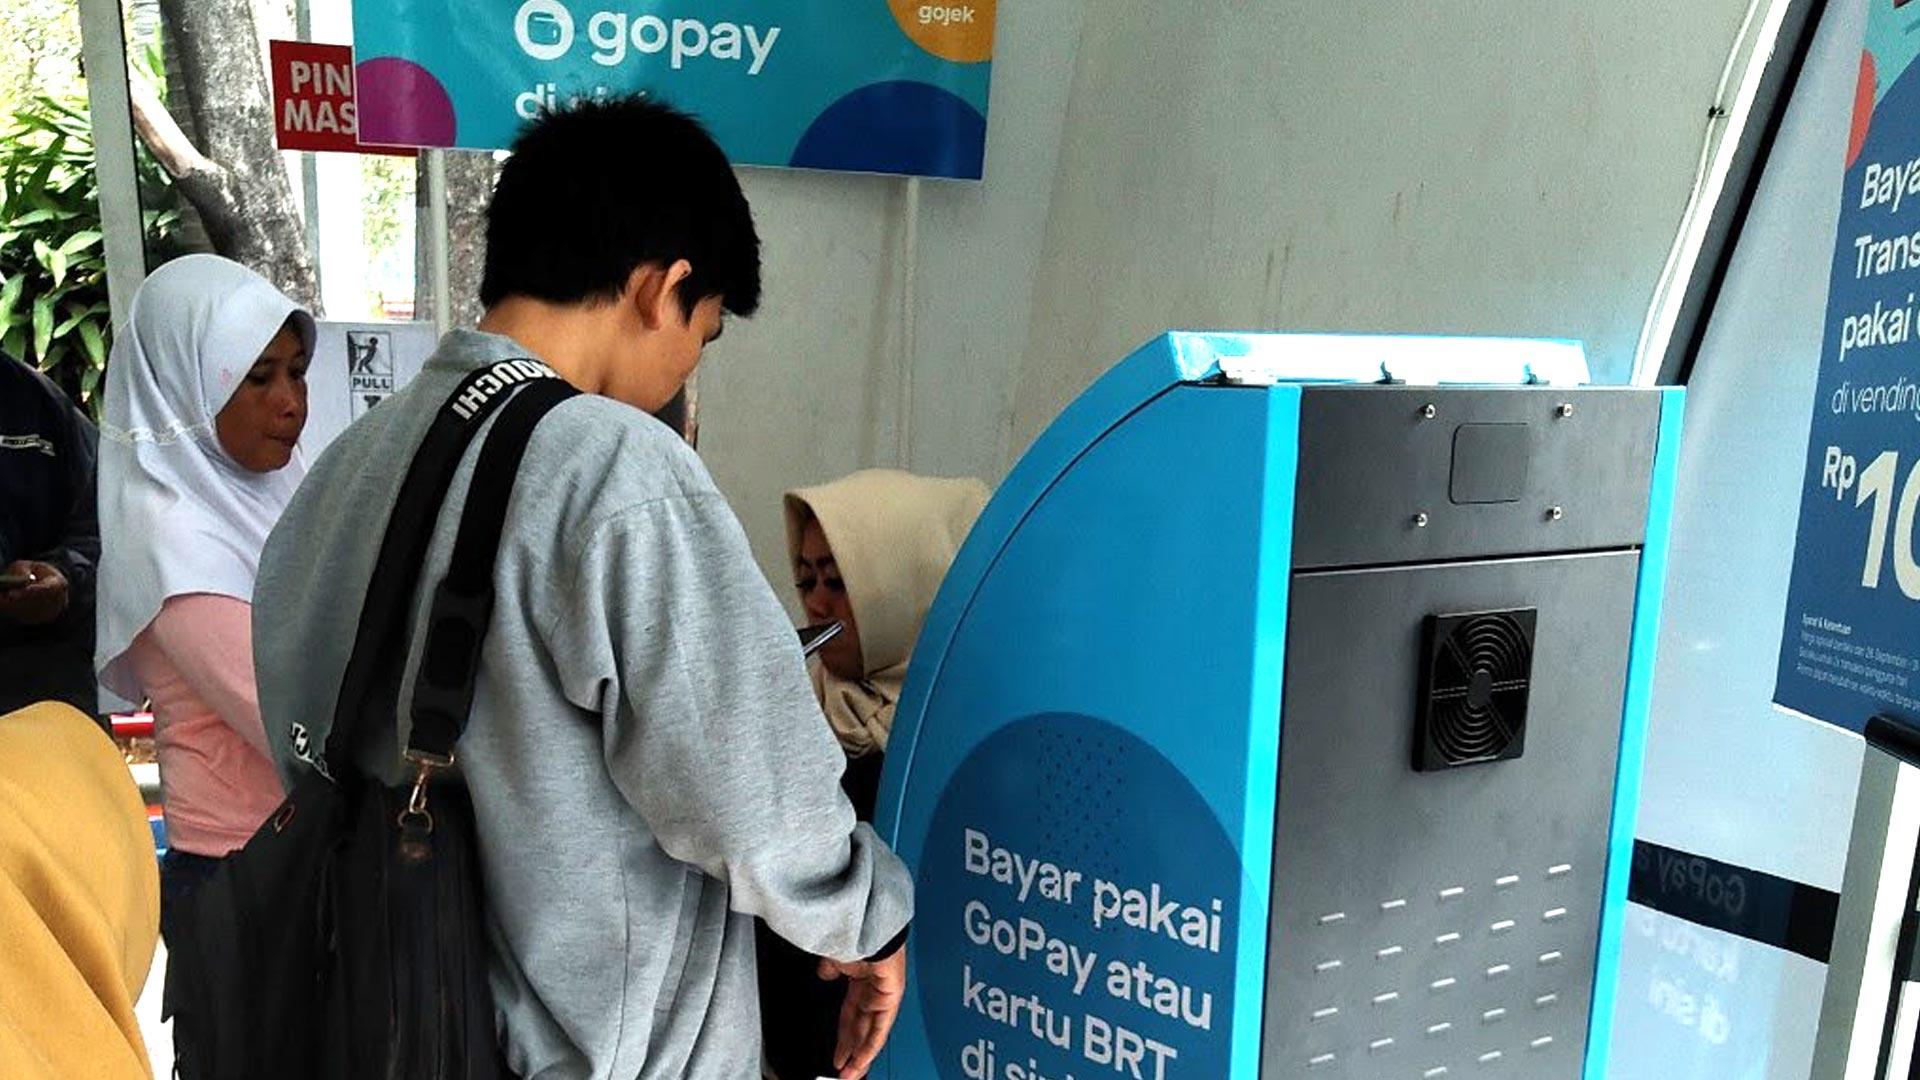 vending machine gopay